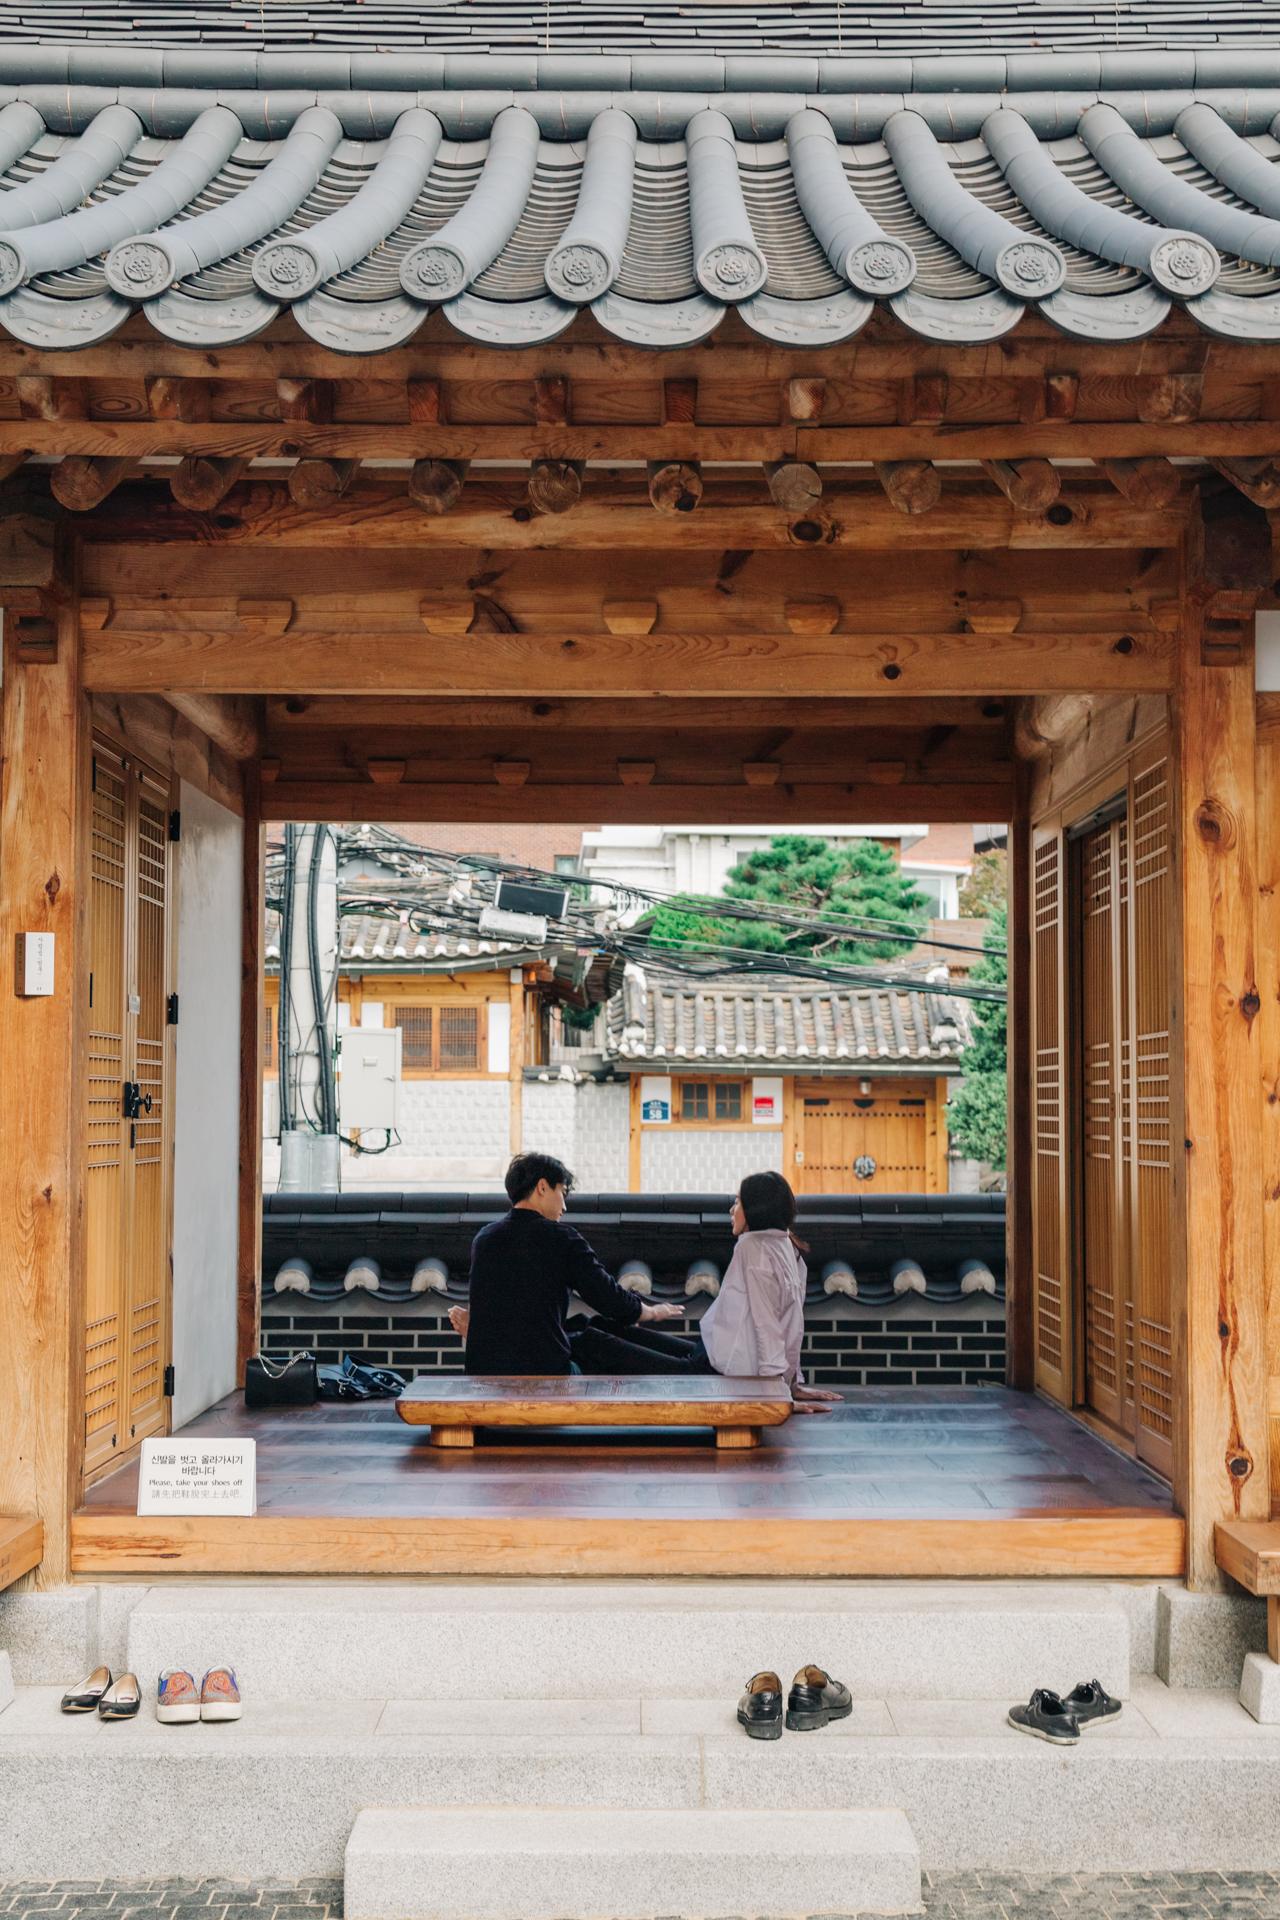 Bukchon-Hanok-Village-3.jpg